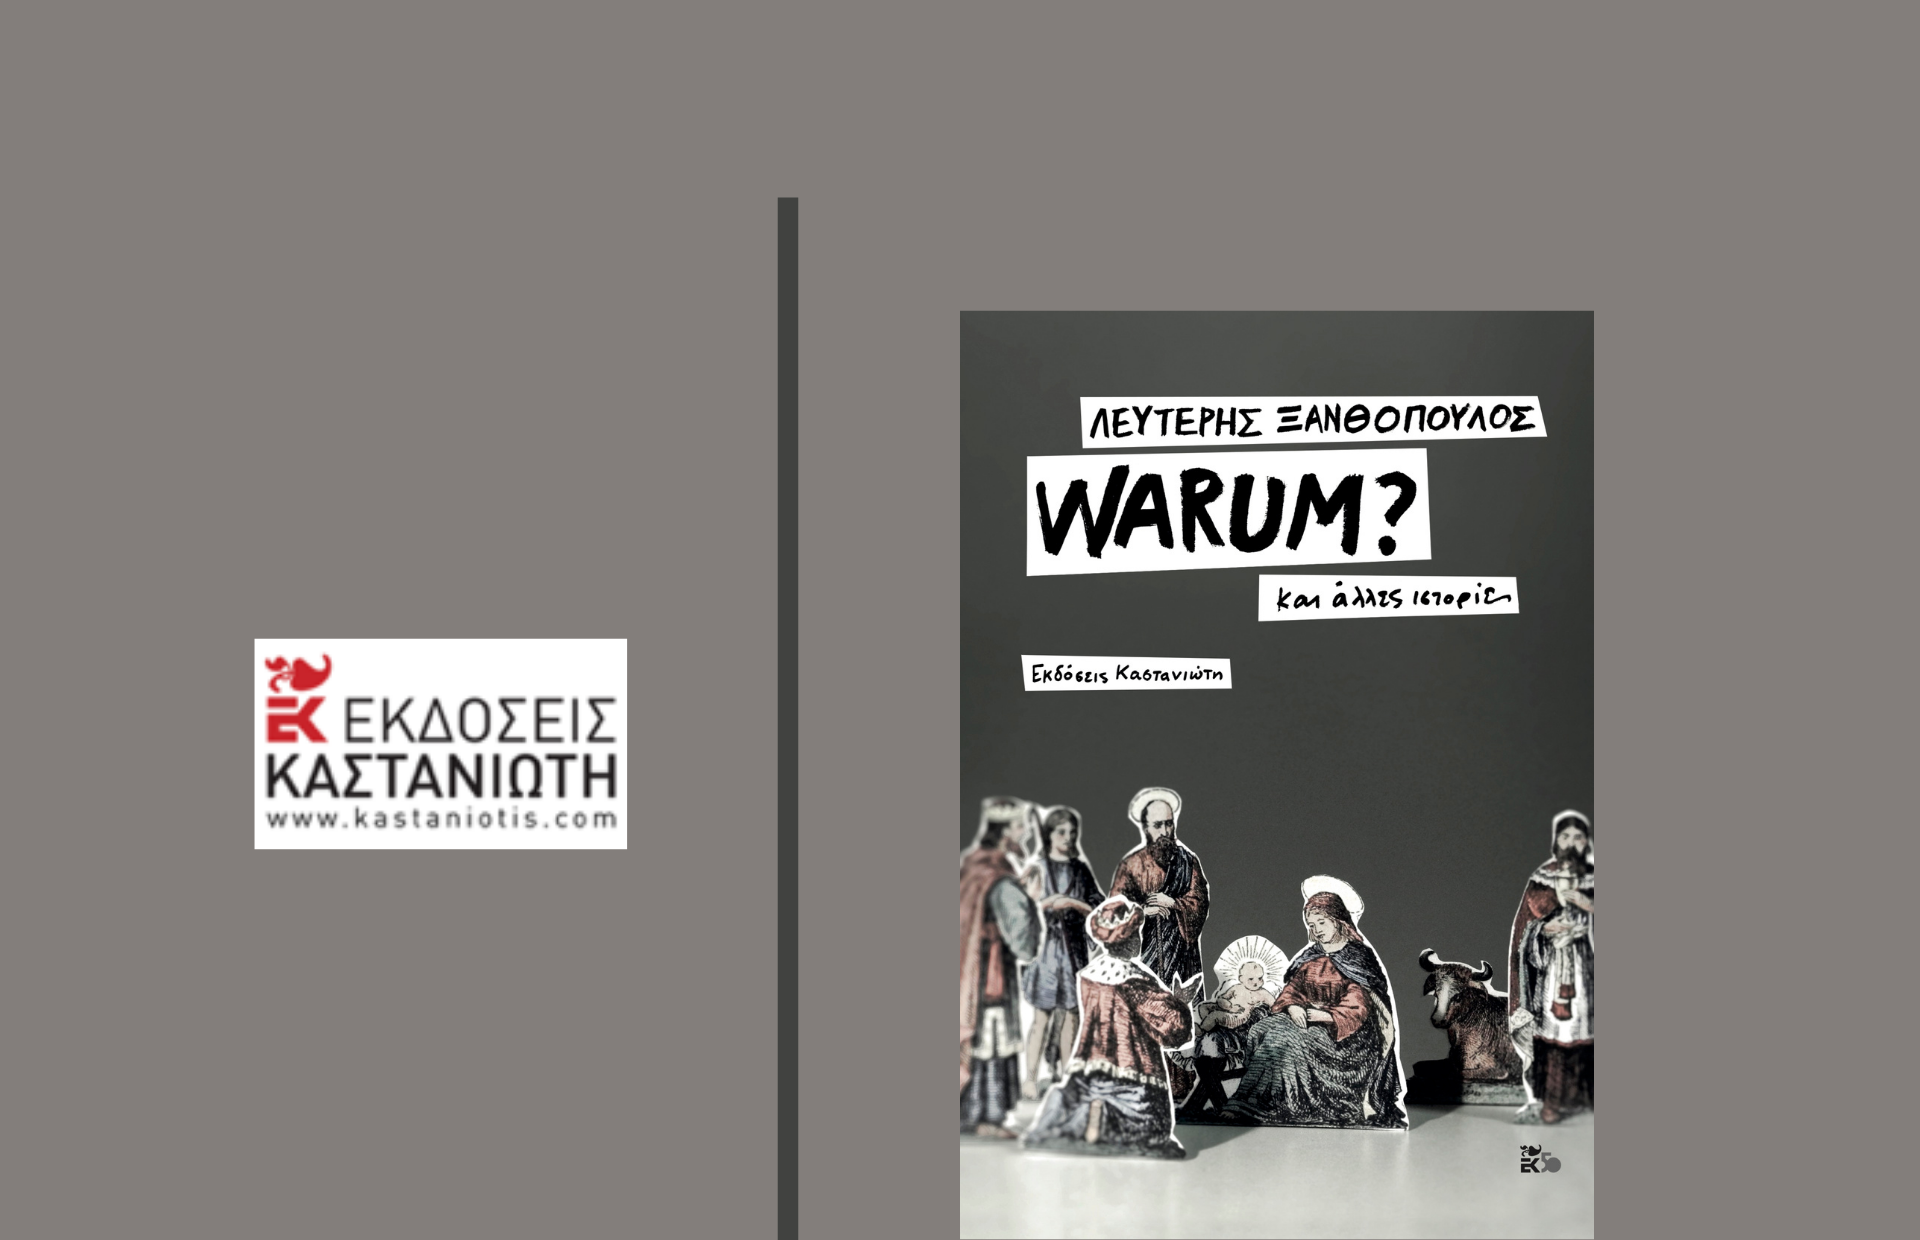 Warum? και άλλες ιστορίες, του Λευτέρη Ξανθόπουλου | Εκδόσεις Καστανιώτη